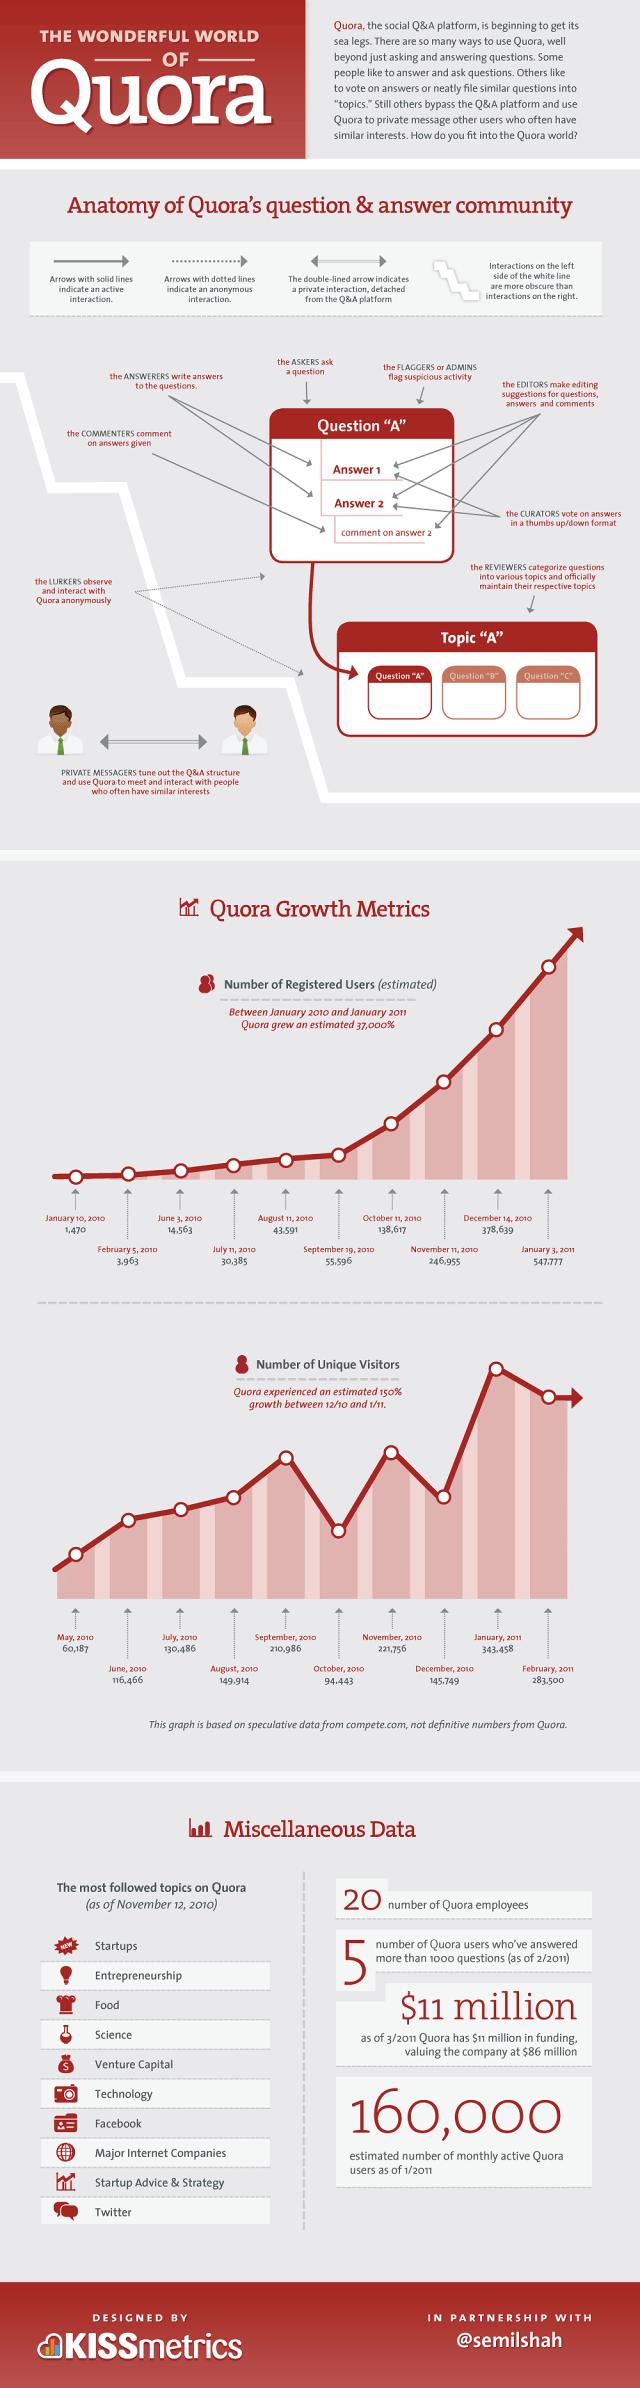 the wonderful world of Quora